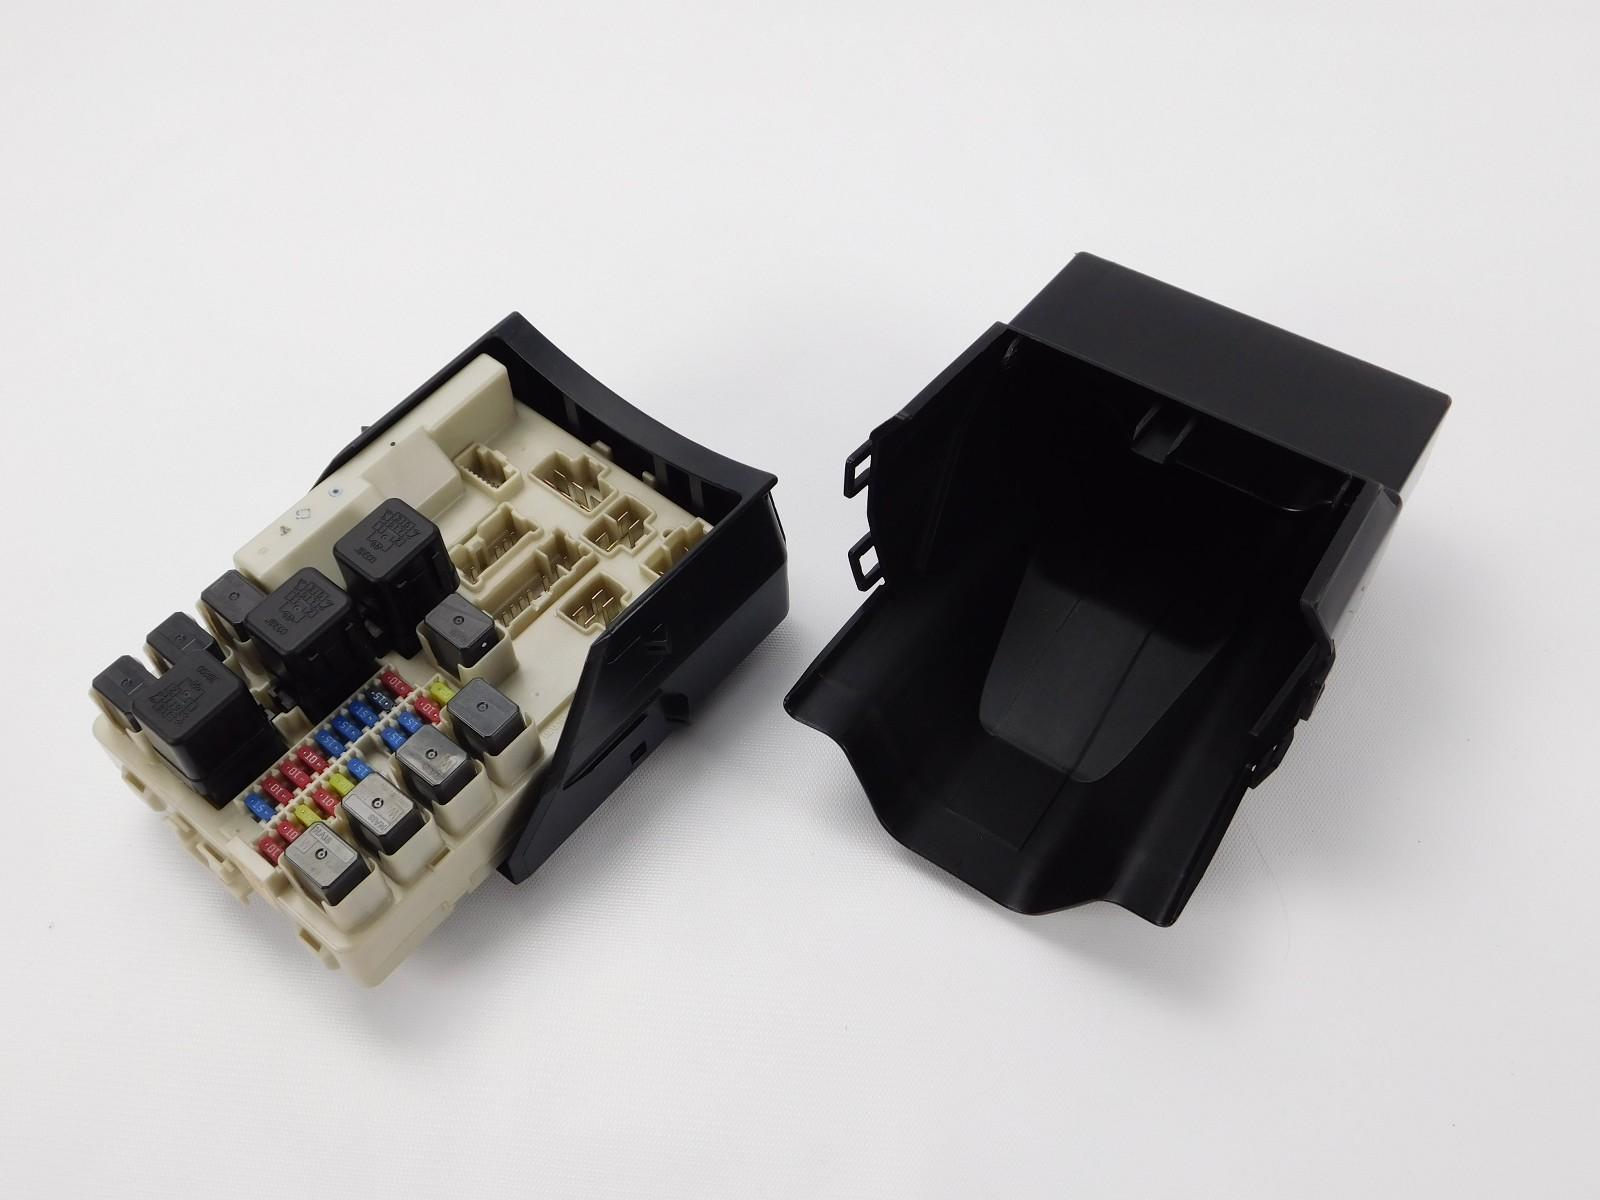 350z Fuse Box Auto Electrical Wiring Diagram Pacar W900 2001 2005